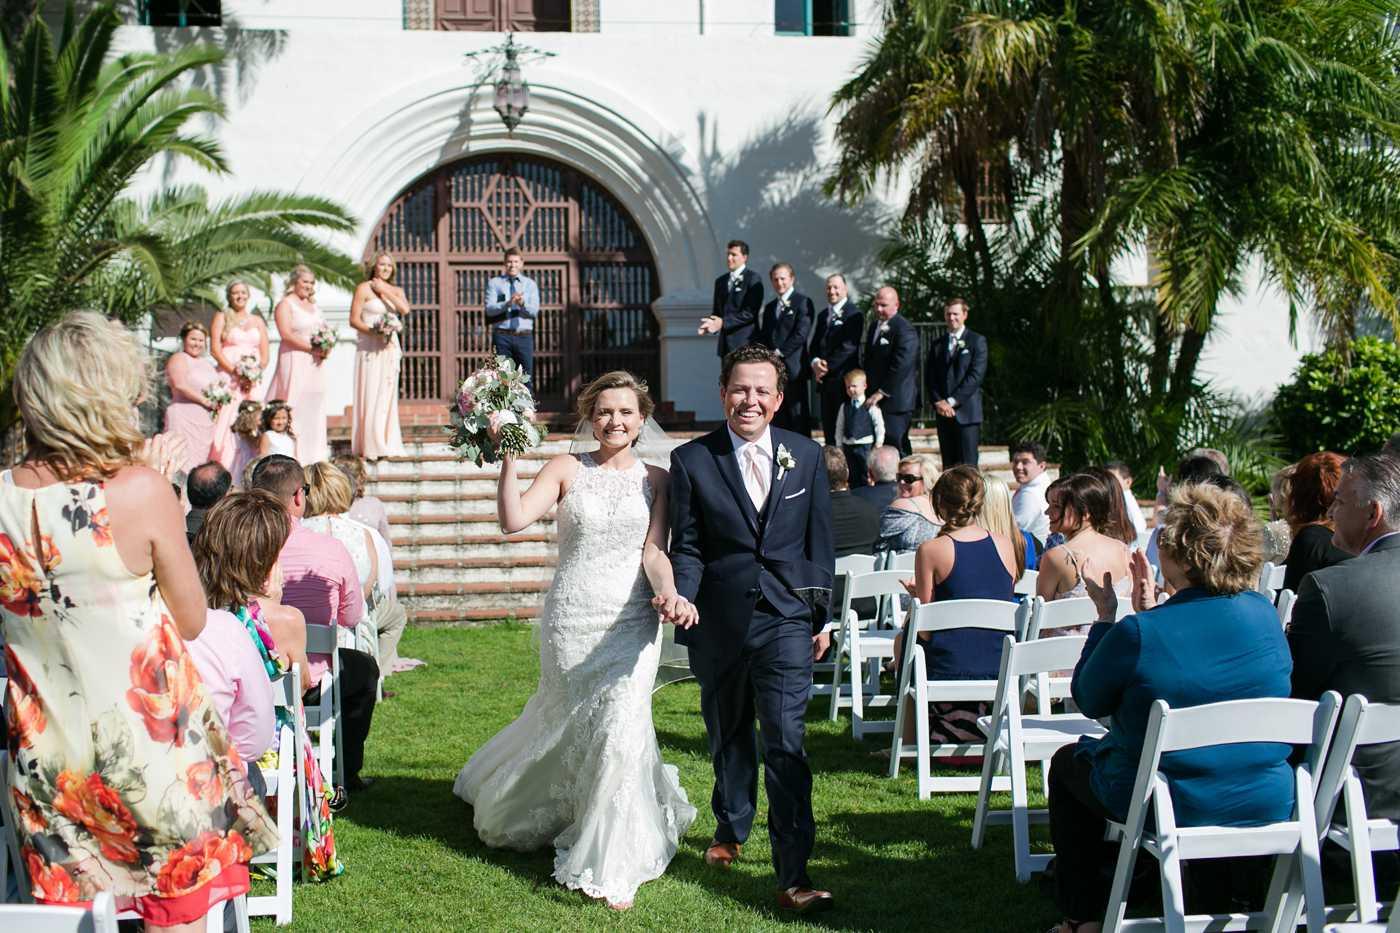 Santa Barbara Courthouse Wedding  Sarah and John  Kaysha Weiner Photographer